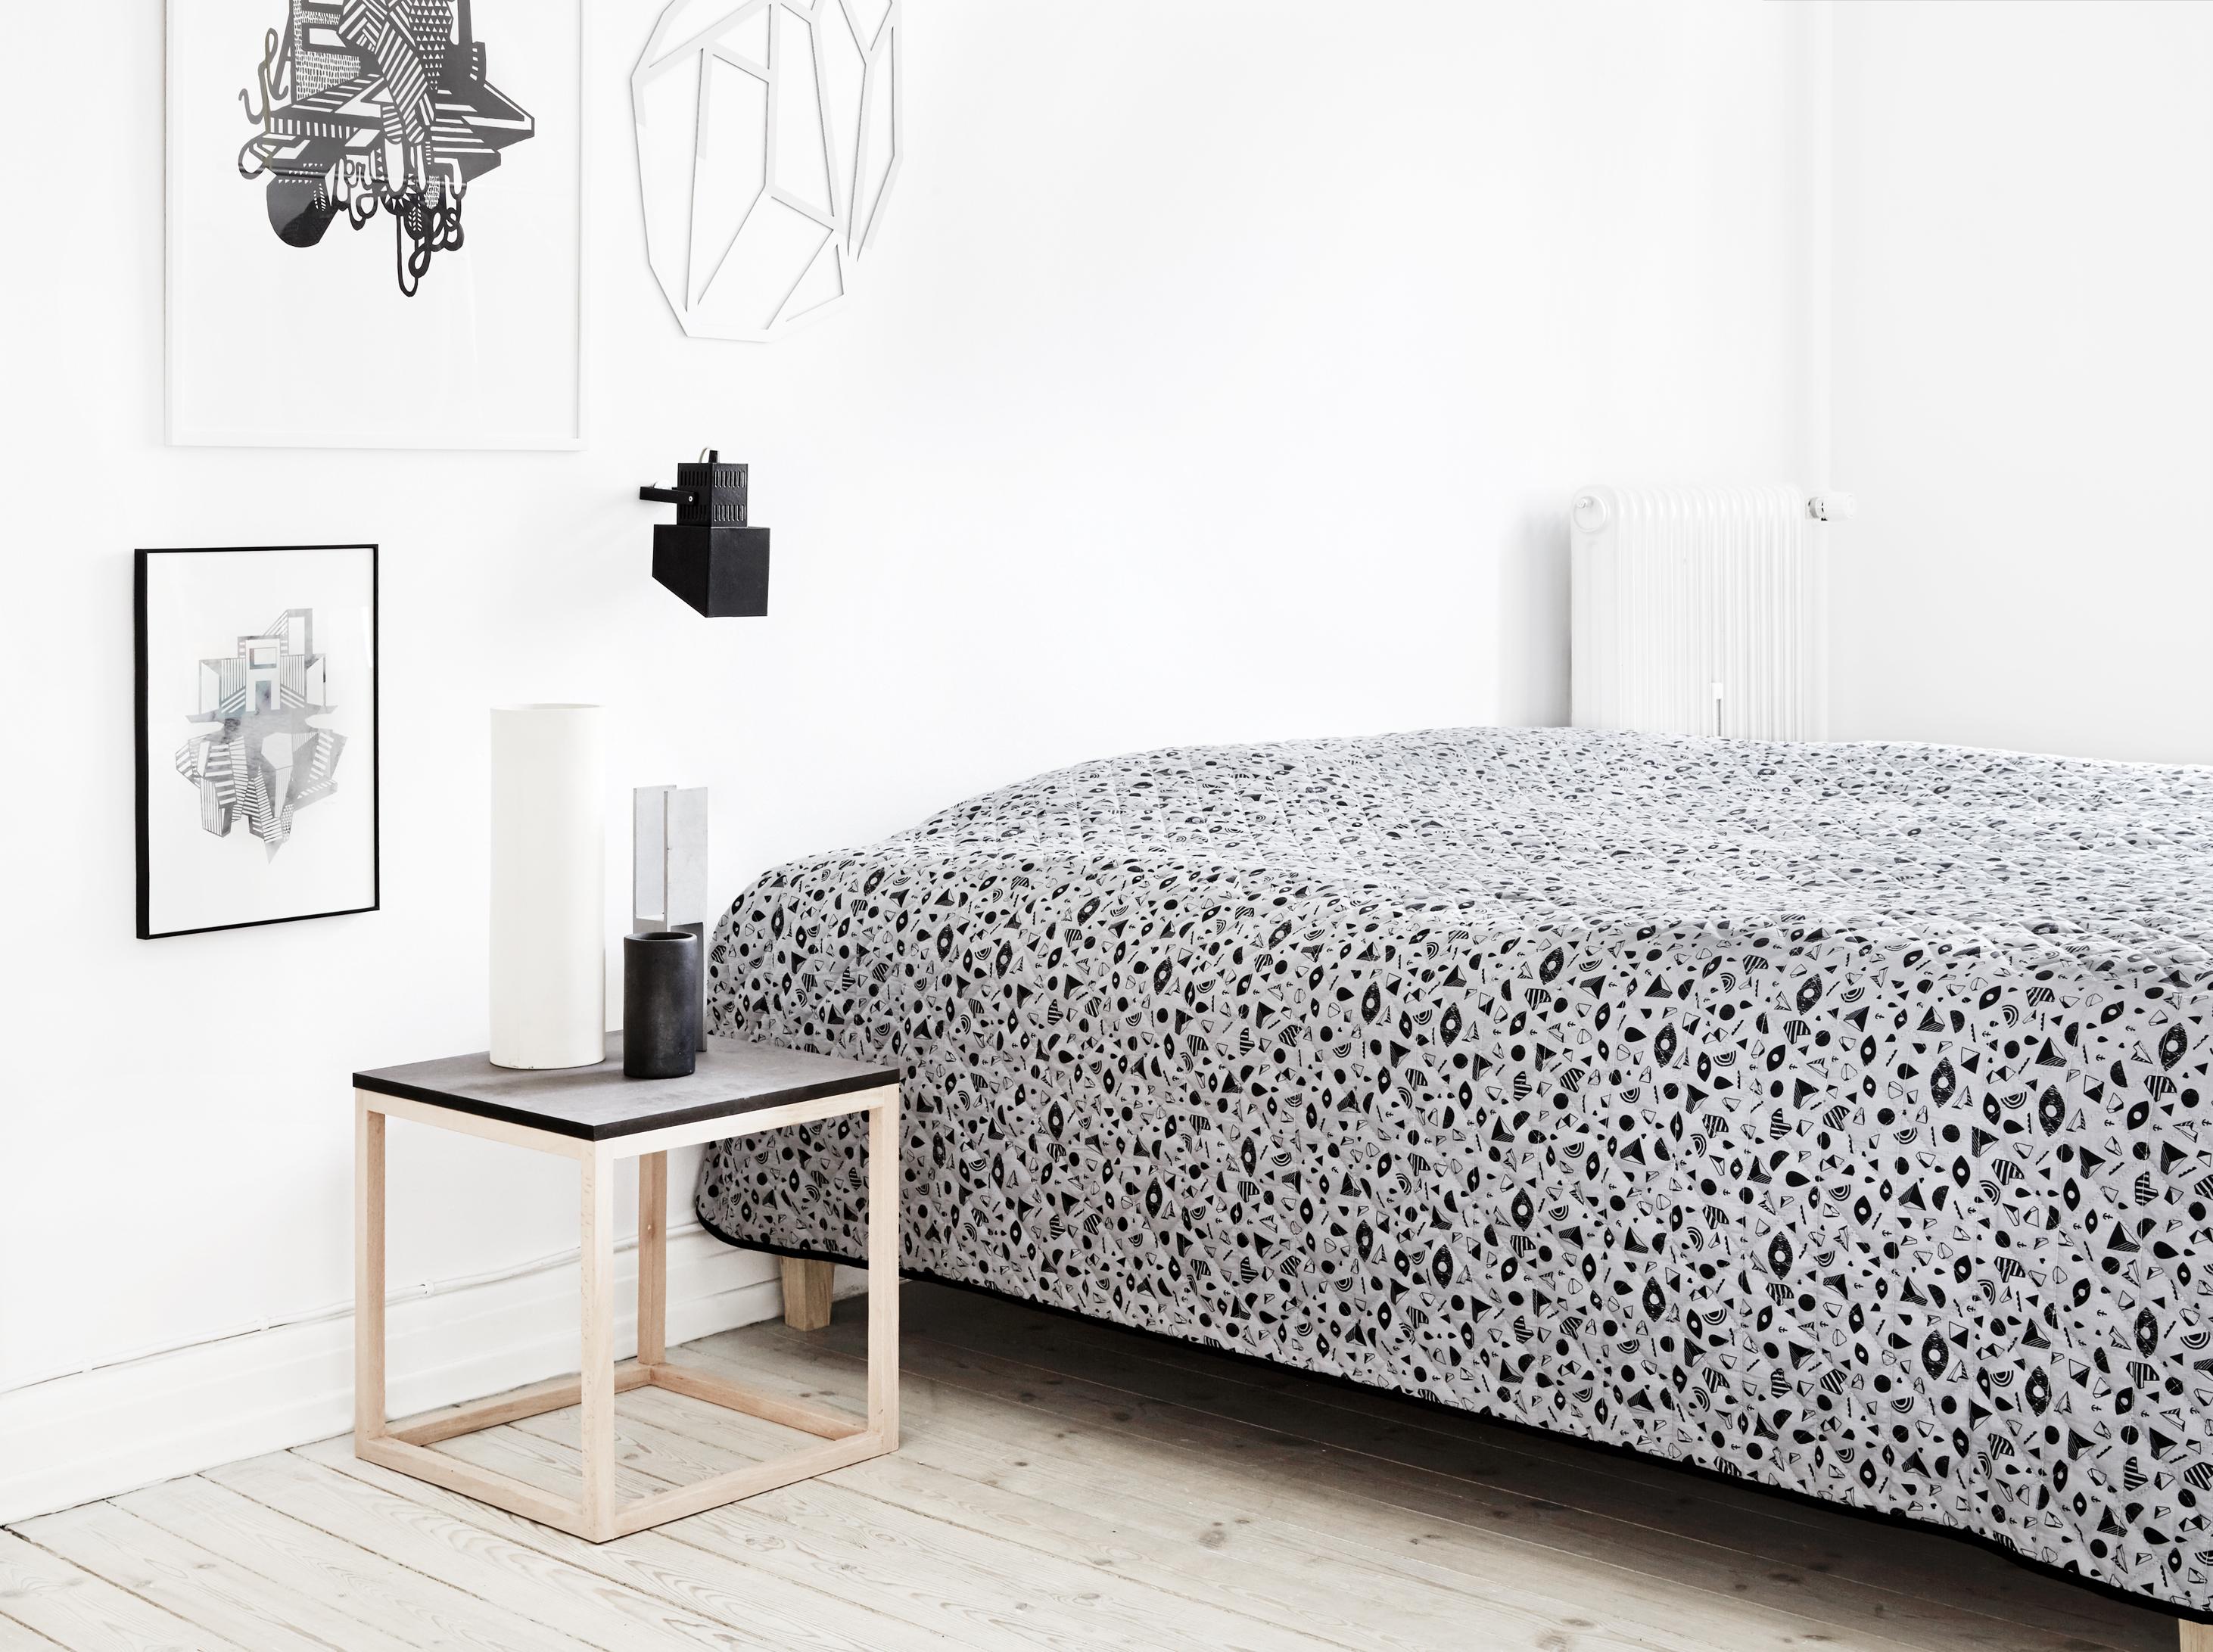 inspirierend aufbewahrung f r ohrstecker selber machen. Black Bedroom Furniture Sets. Home Design Ideas